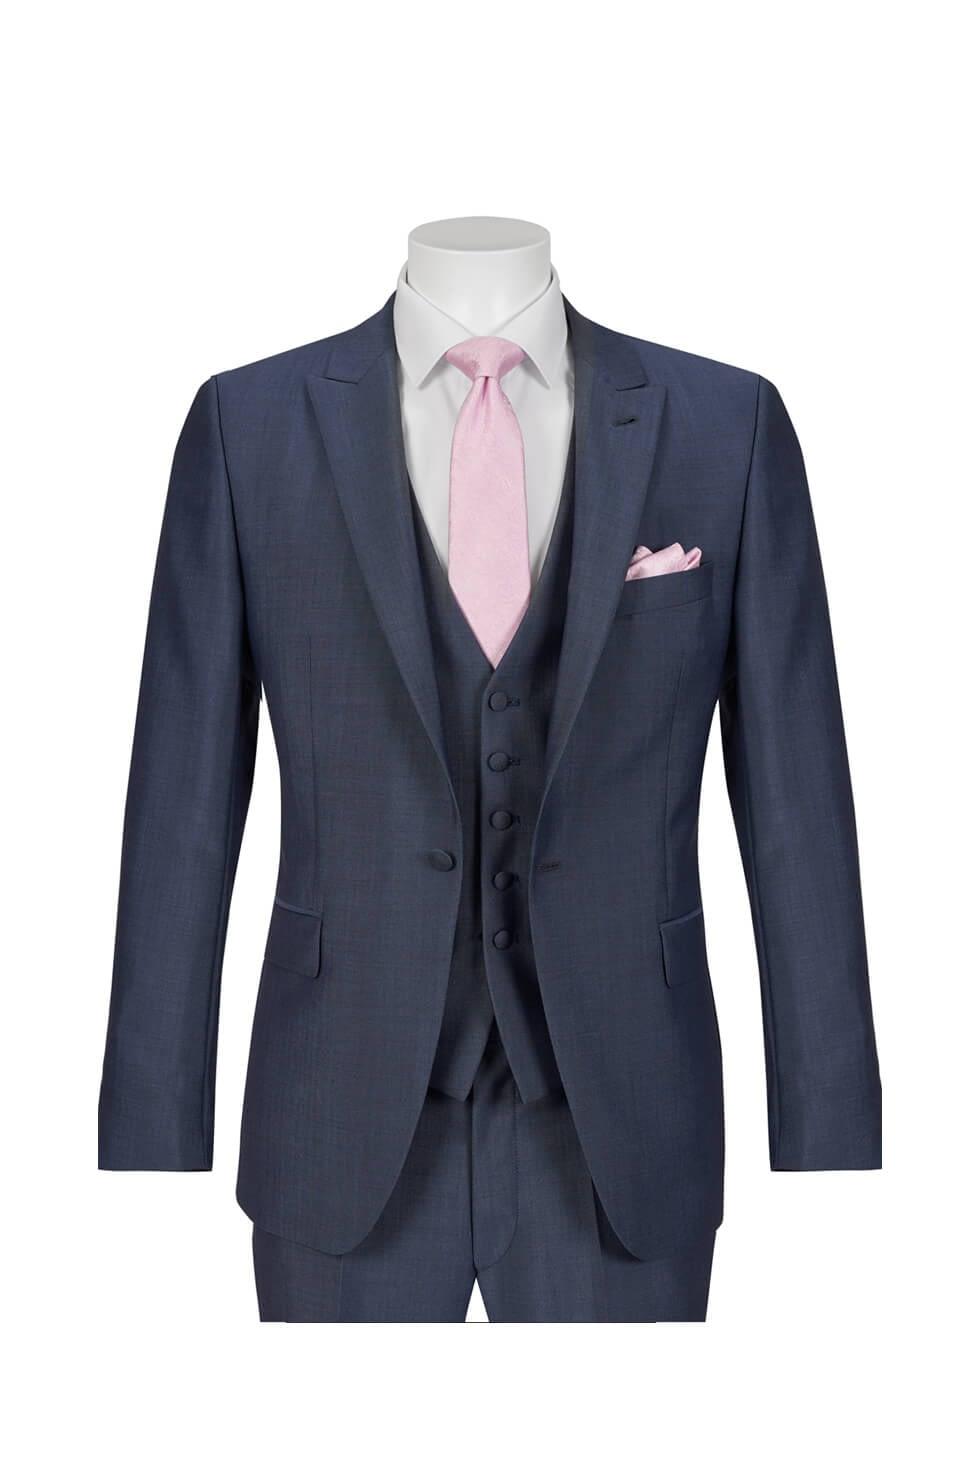 Wilvorst Ice Blue Lounge Suit